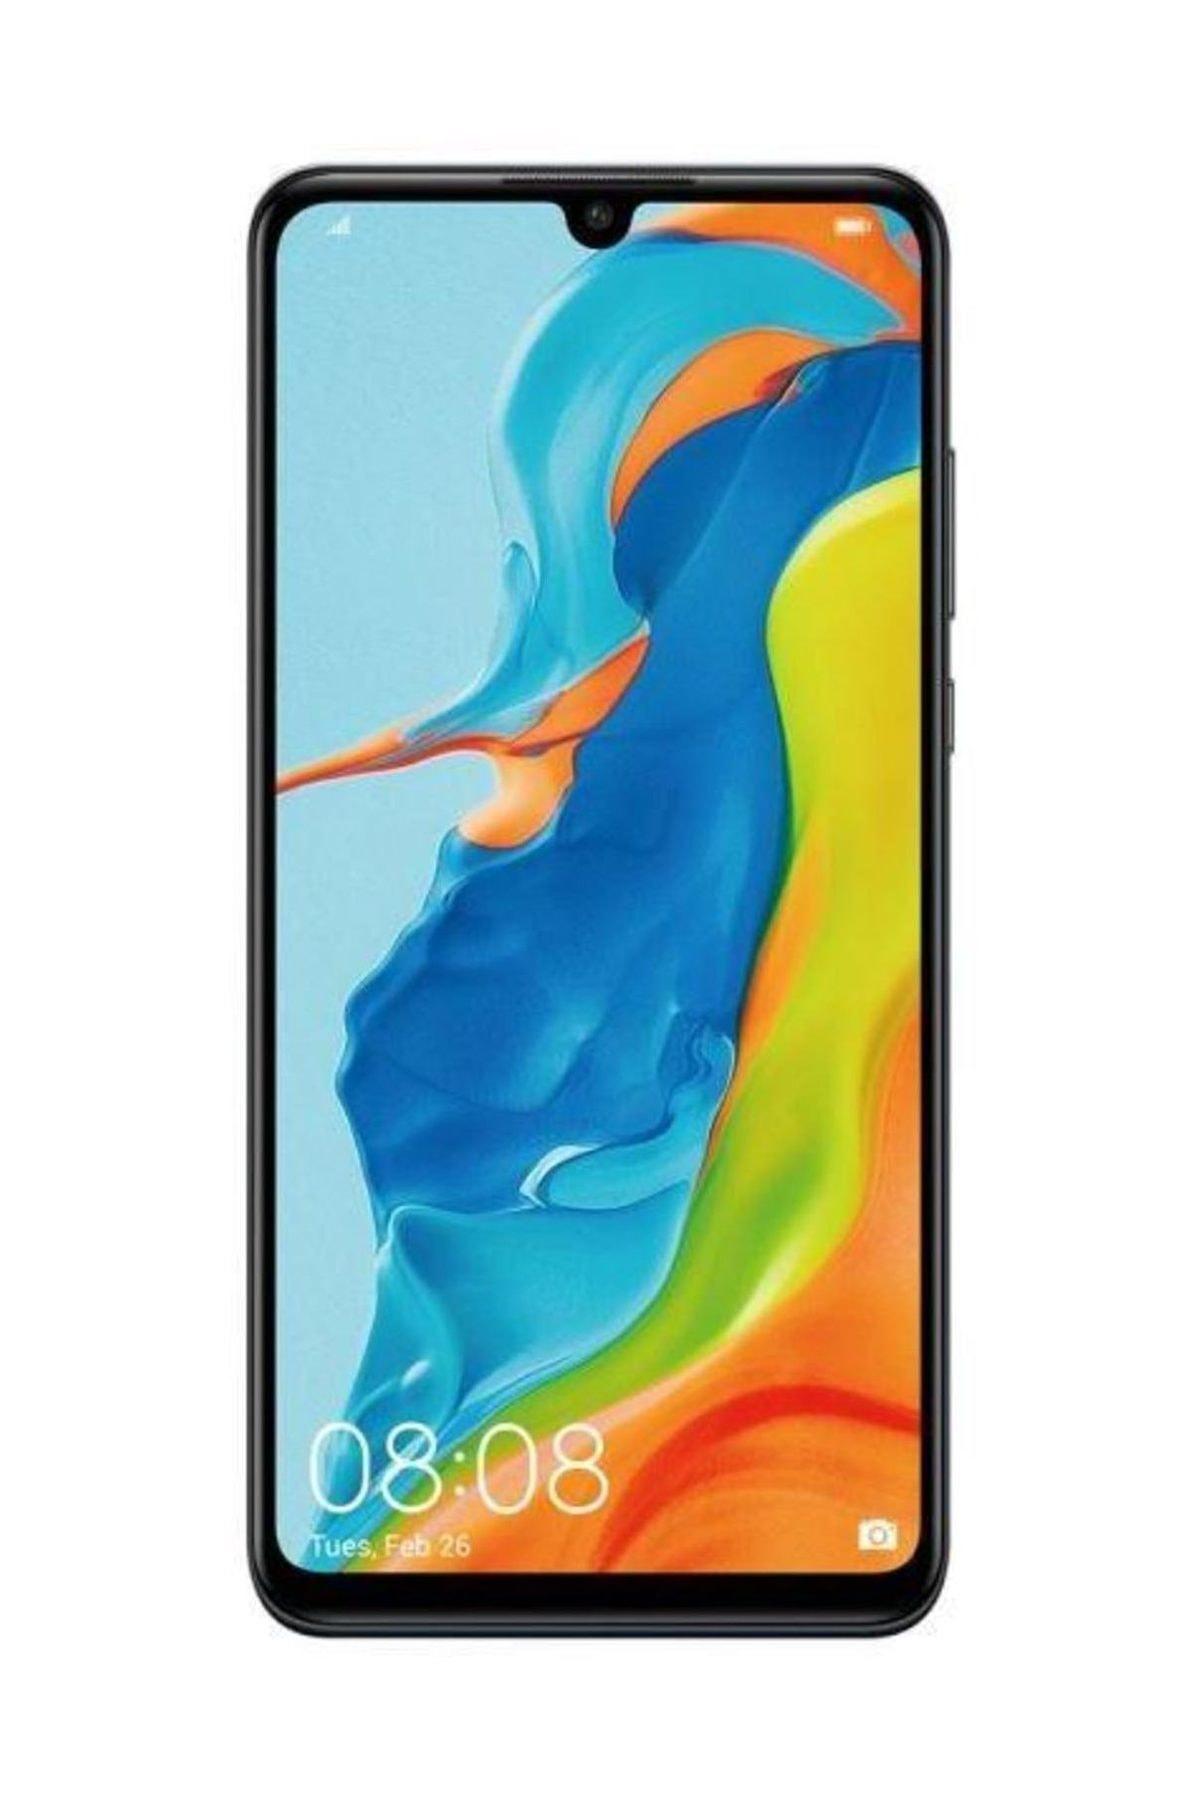 Huawei P30 Lite 64 GB Gece Siyahı Akıllı Telefon ( Huawei Türkiye Garantili ) 1